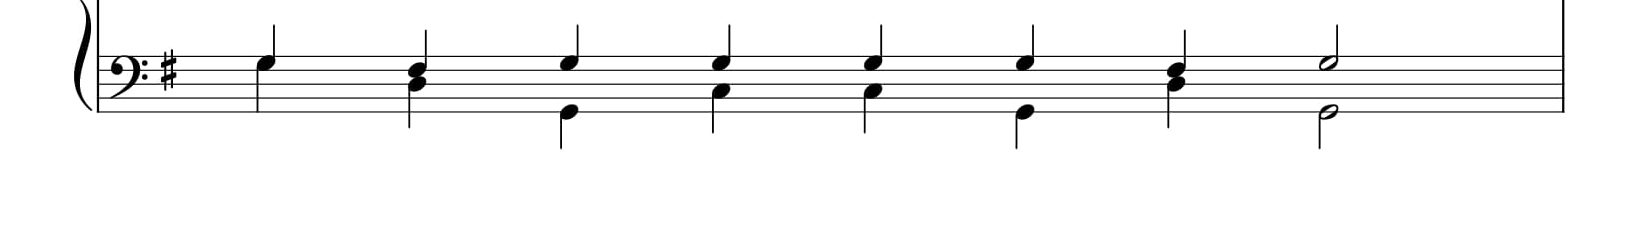 Бог Господь, 8 глас, валаамский распев